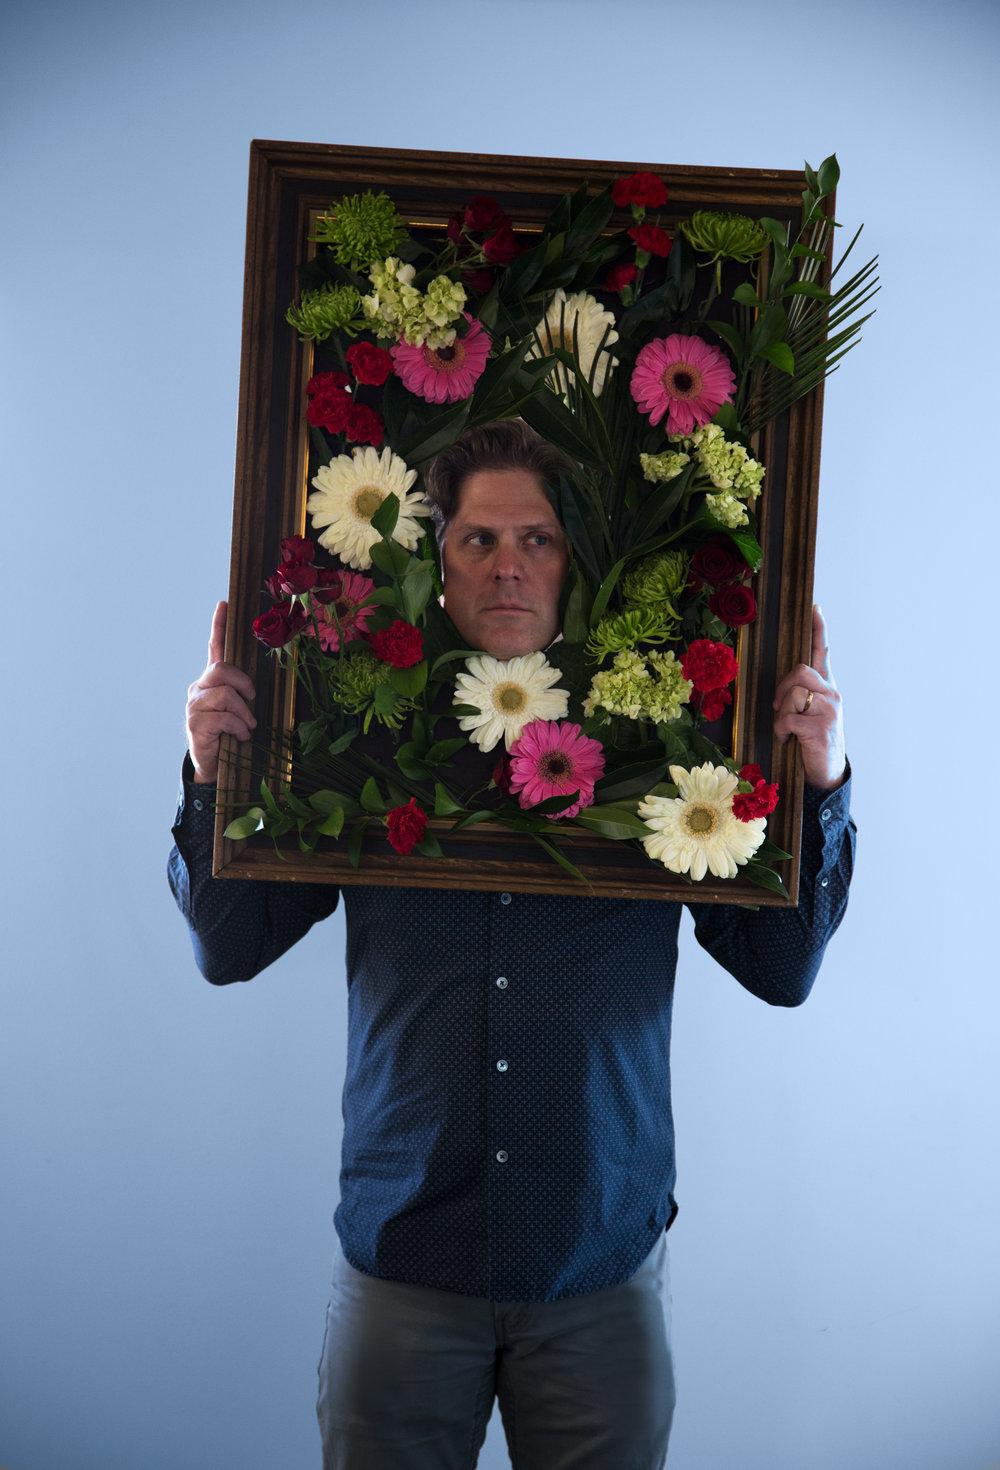 J.W. Schuller flowers (10MB)